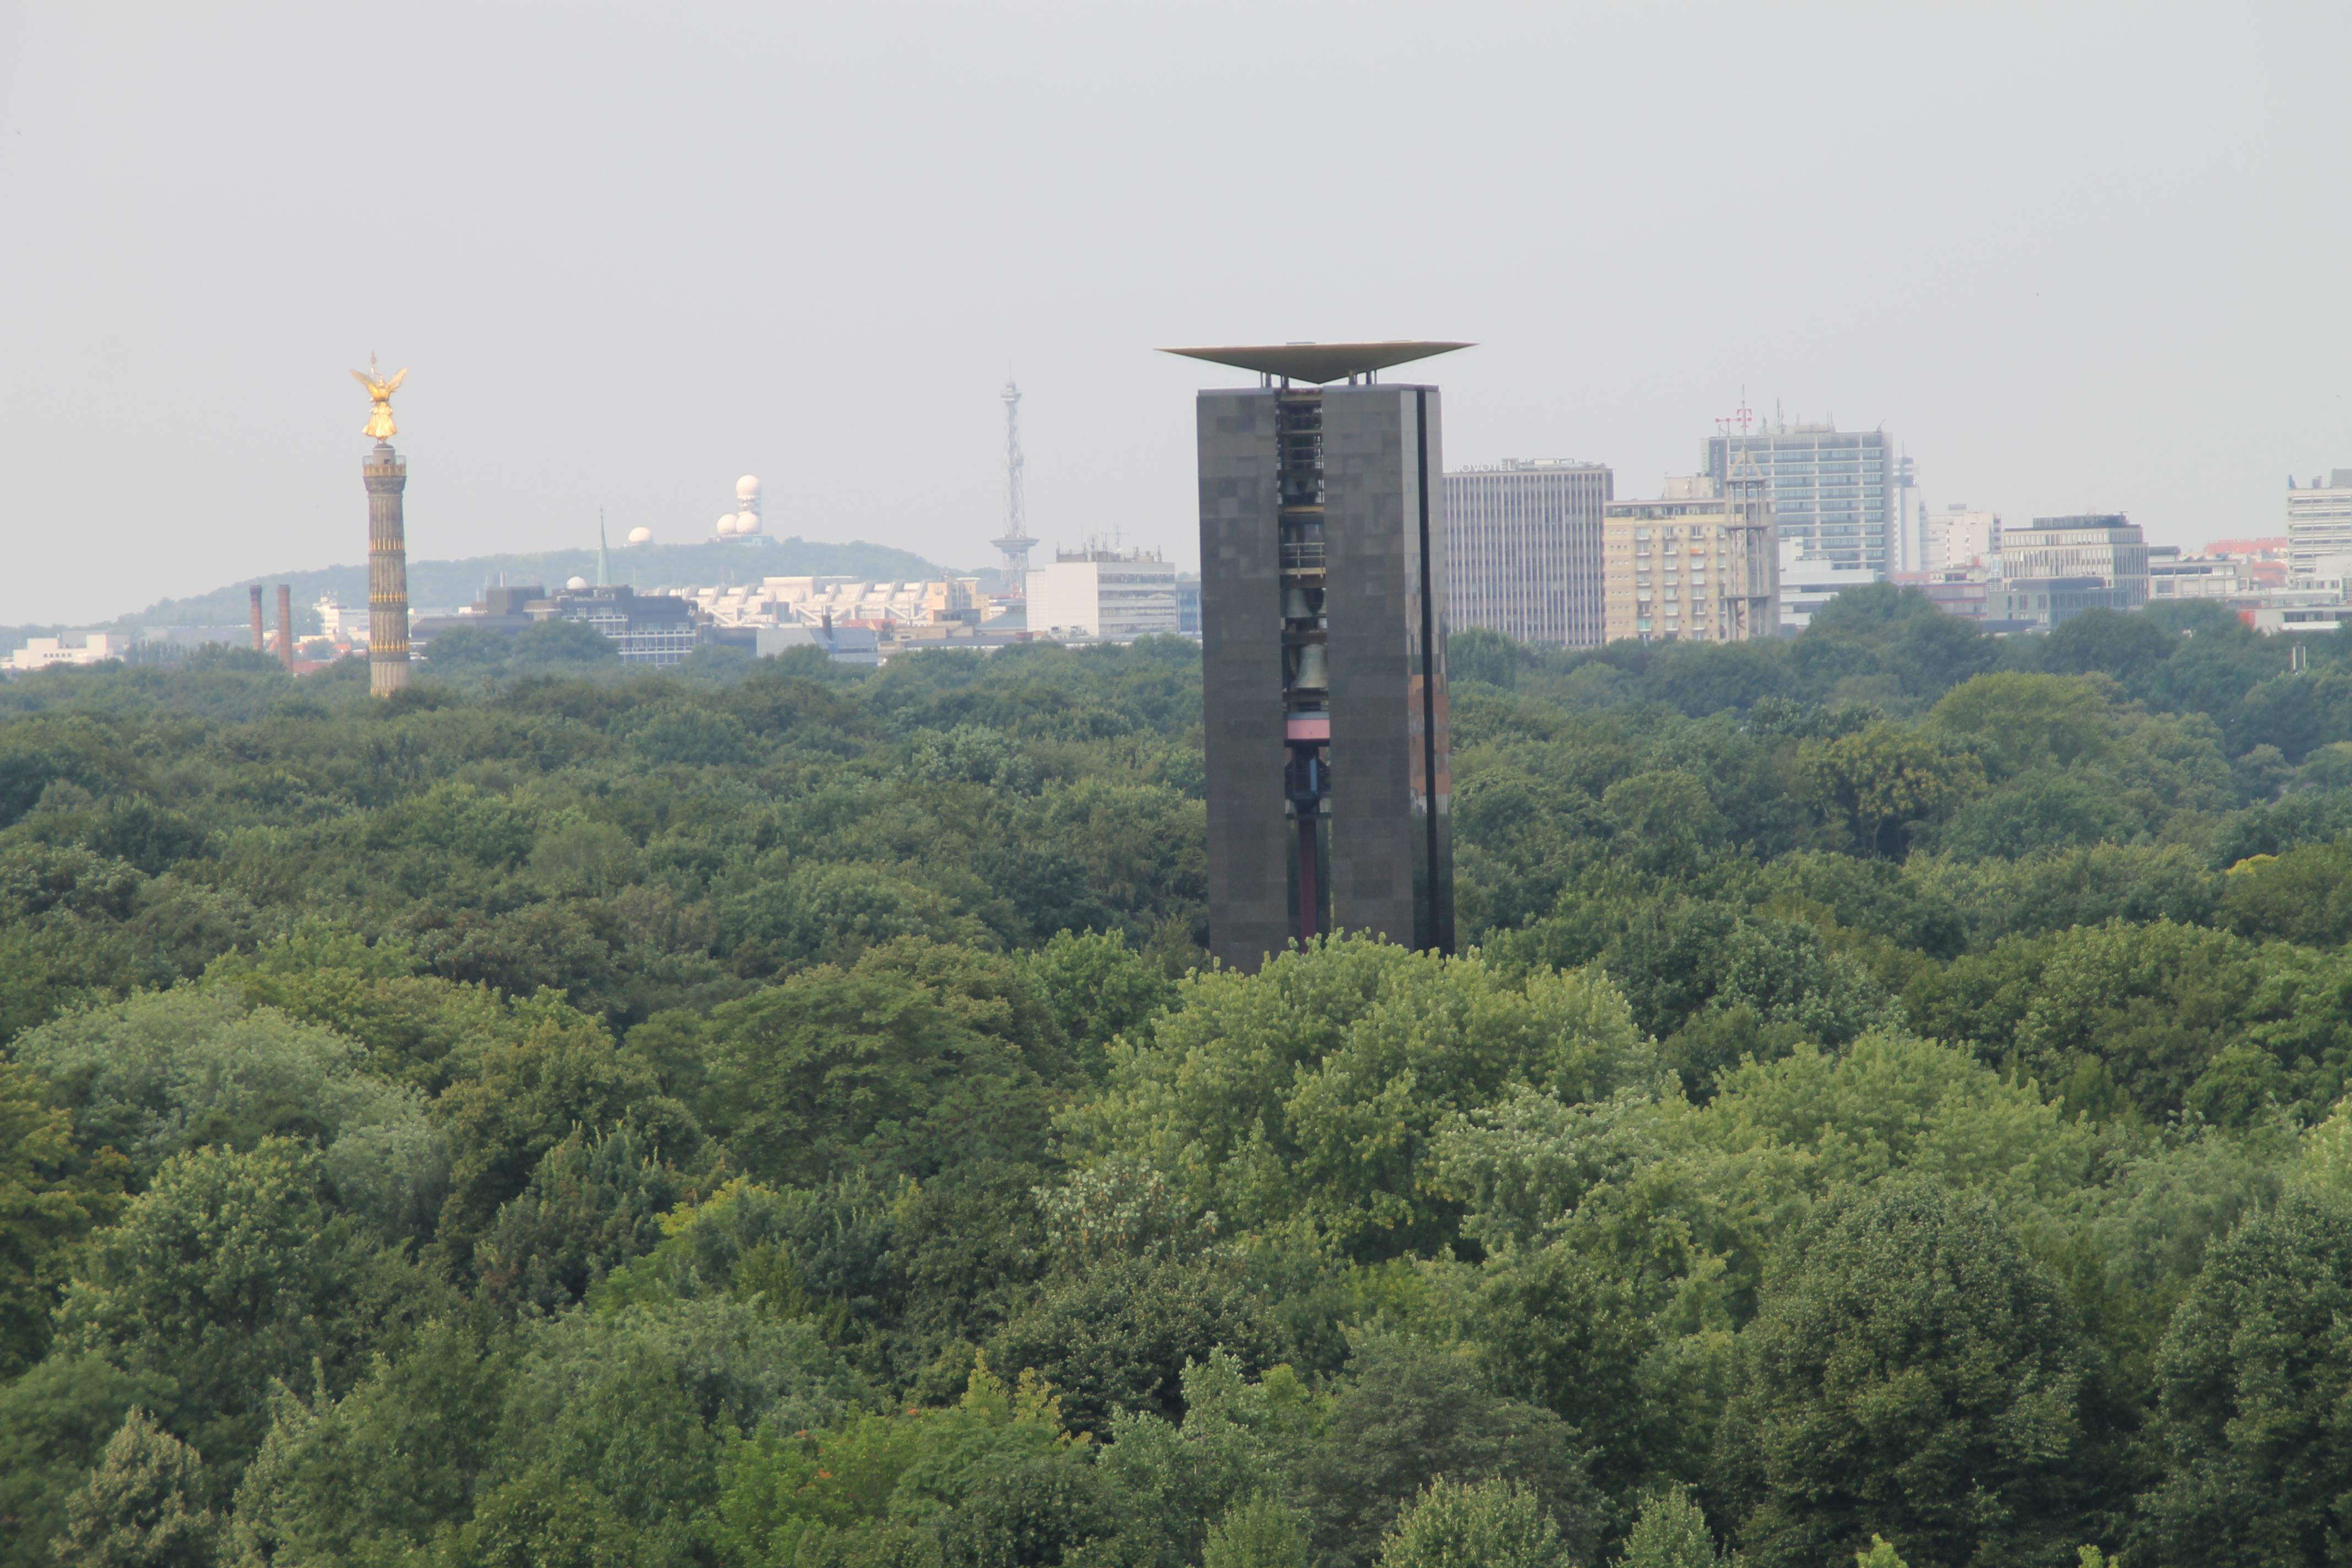 Berlin Carillon i  Siegessäule (Columna de la Victòria) des del Reichstag